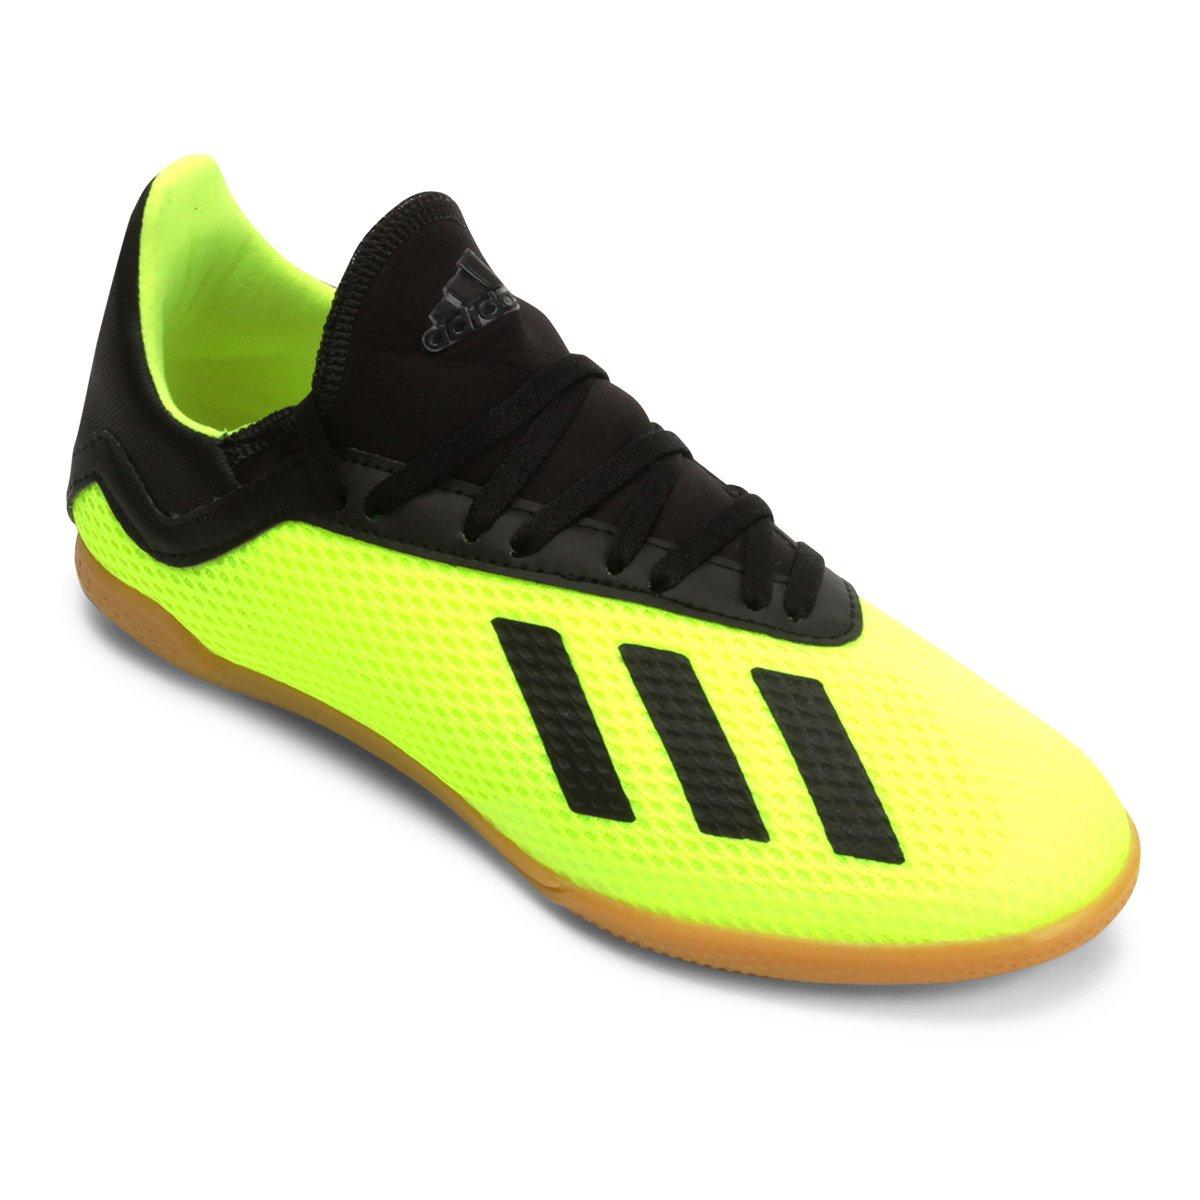 cecb7623f601b Chuteira Futsal Infantil Adidas X Tango 18 3 IN - Compre Agora ...